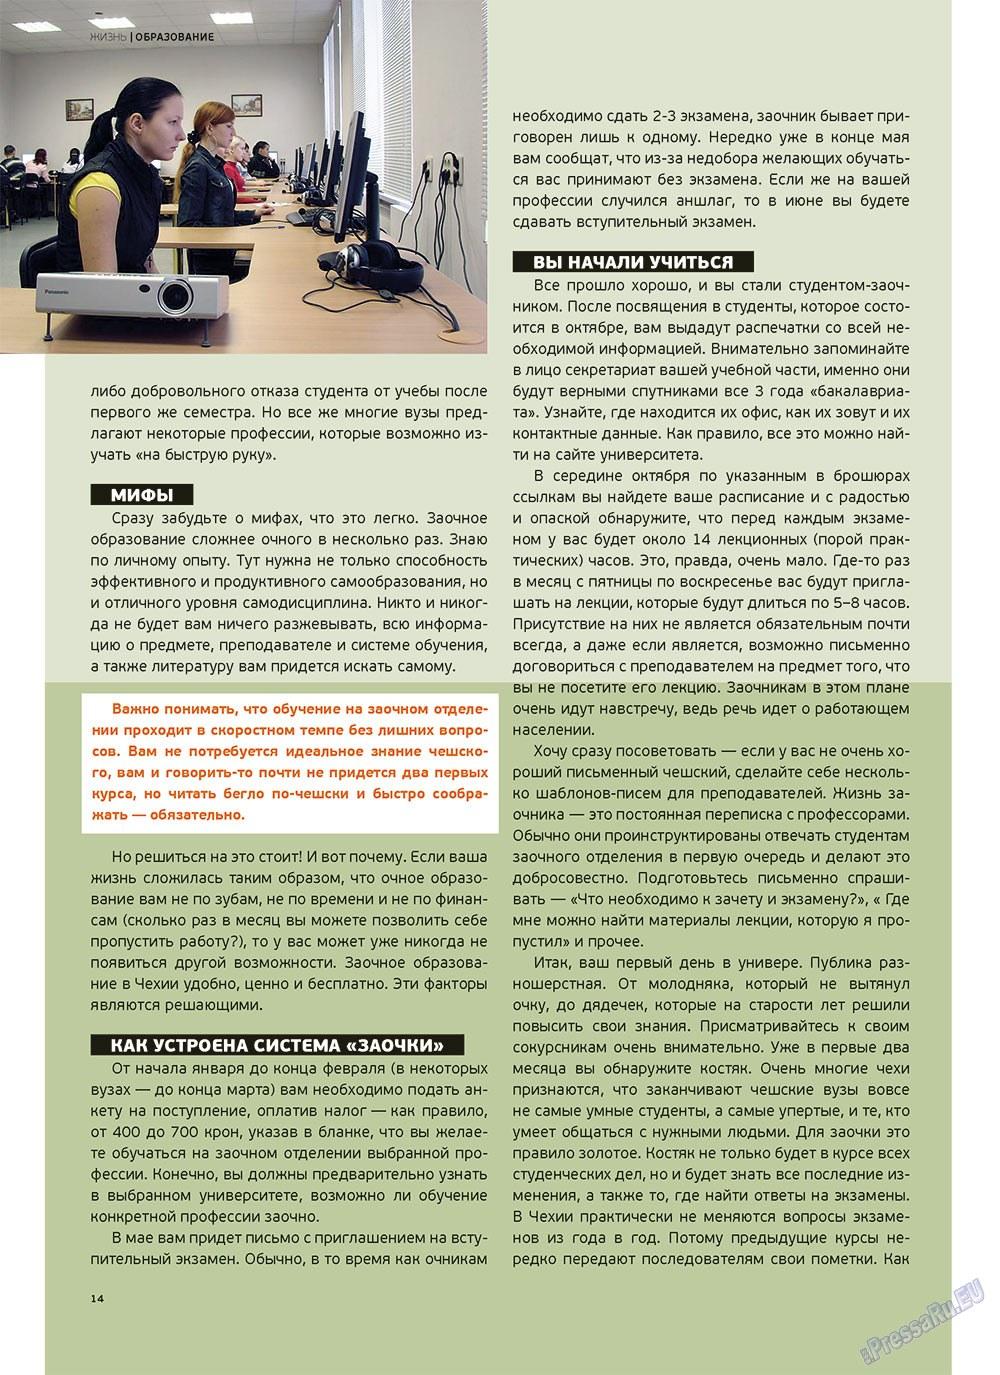 Артек (журнал). 2012 год, номер 6, стр. 16